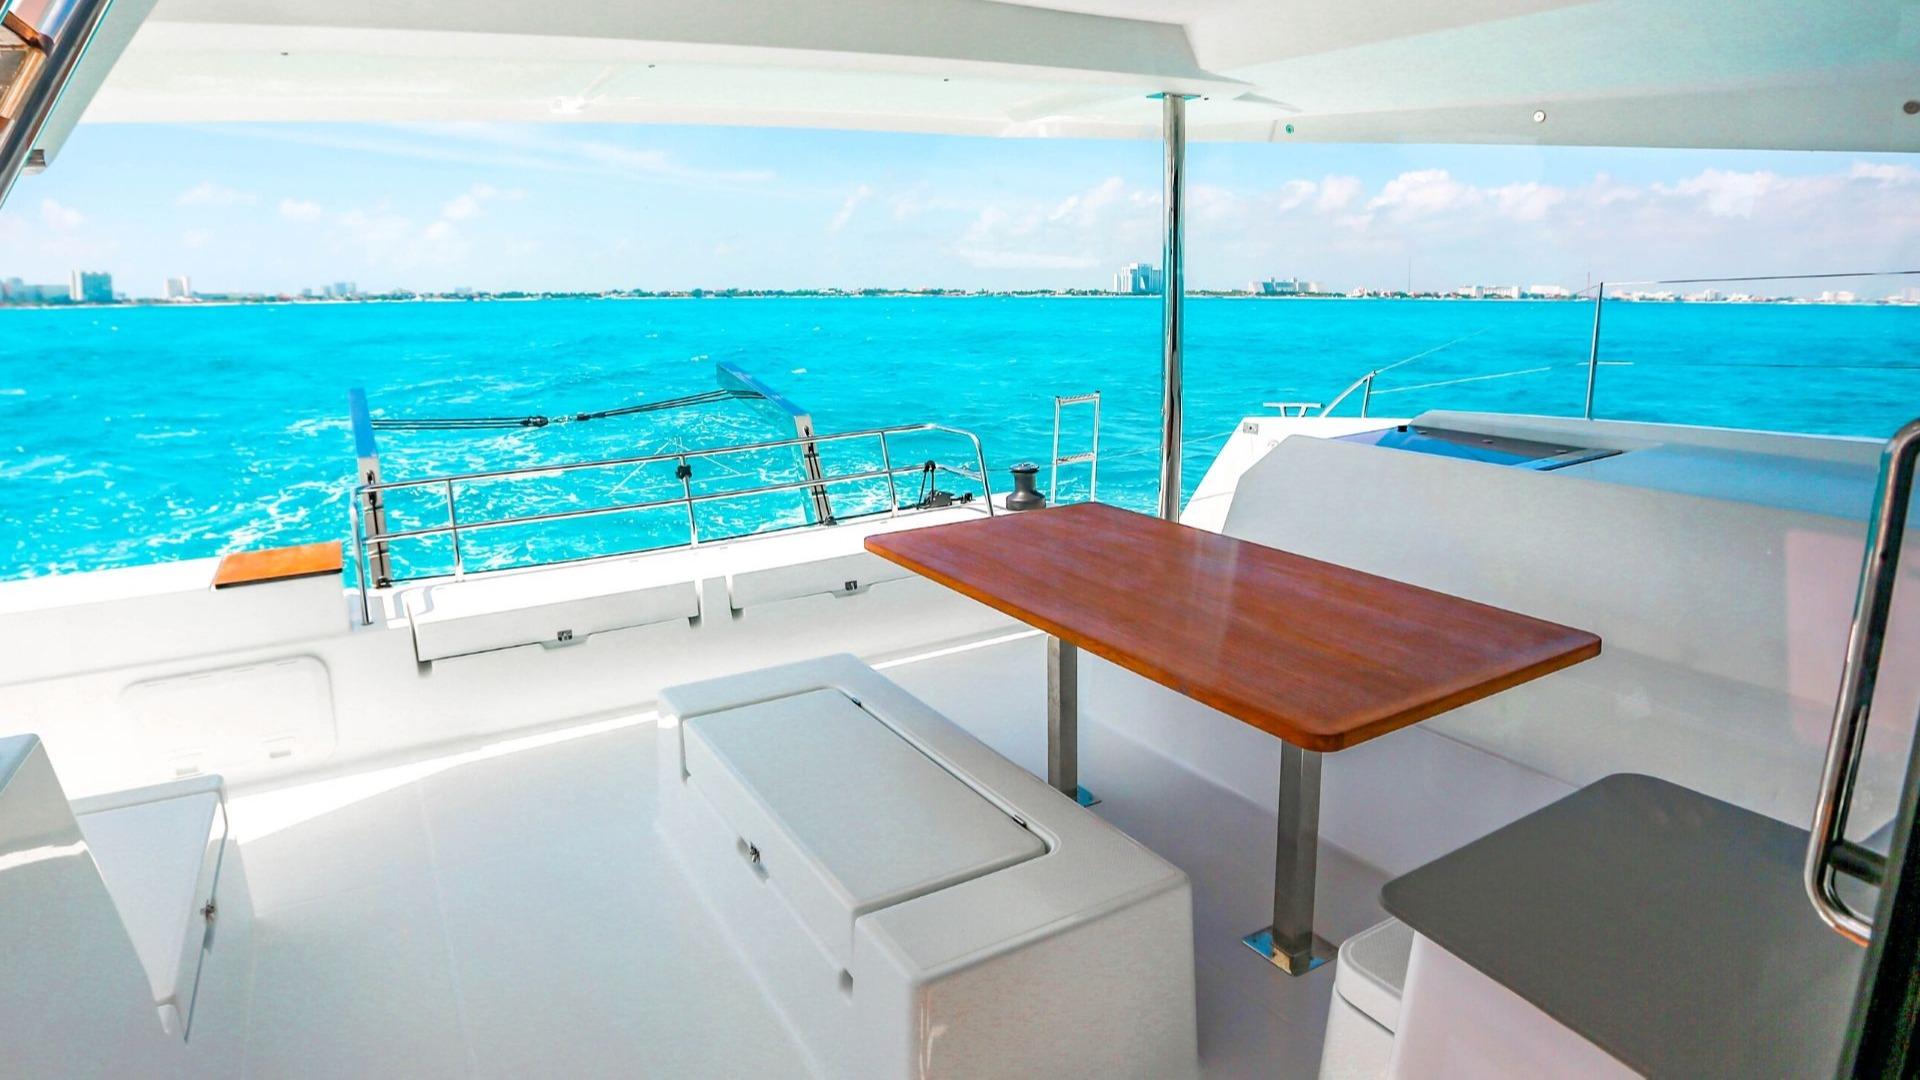 3 - LowRes - Private Isla Mujeres tour in catamaran - Victoria - Cancun Sailing